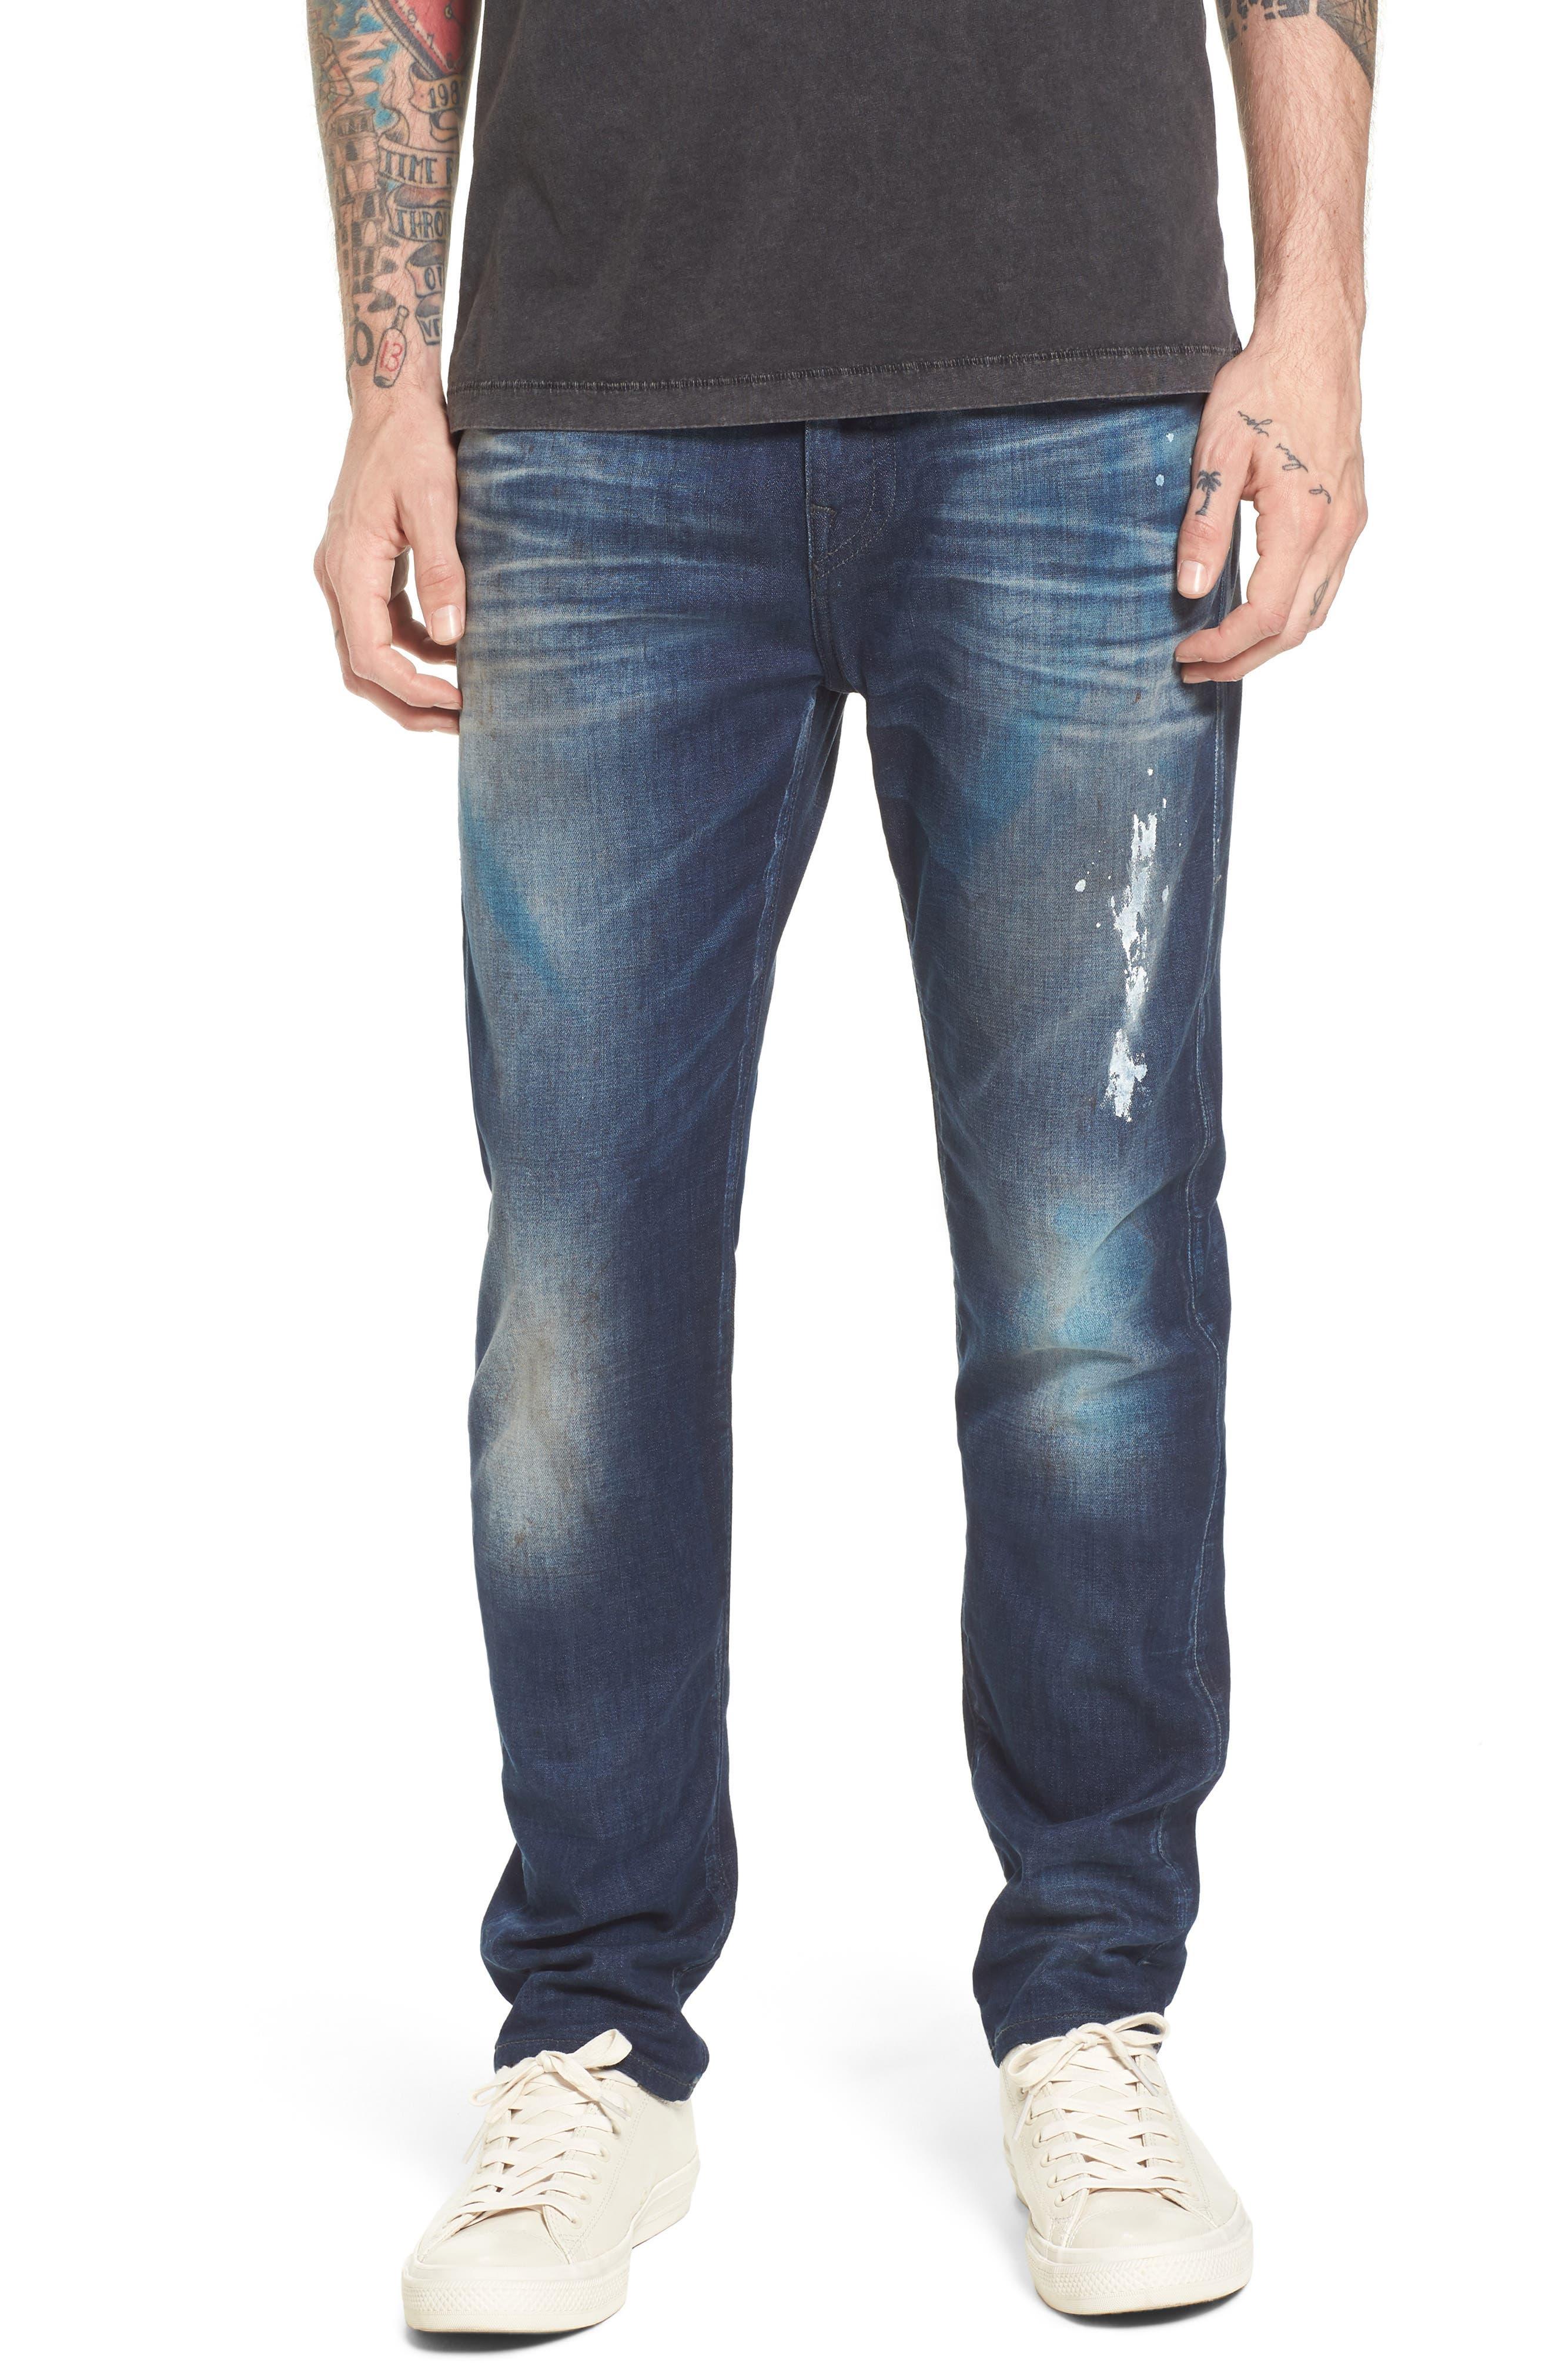 Main Image - True Religion Brand Jeans Rocco Skinny Fit Jeans (Loft Edge)